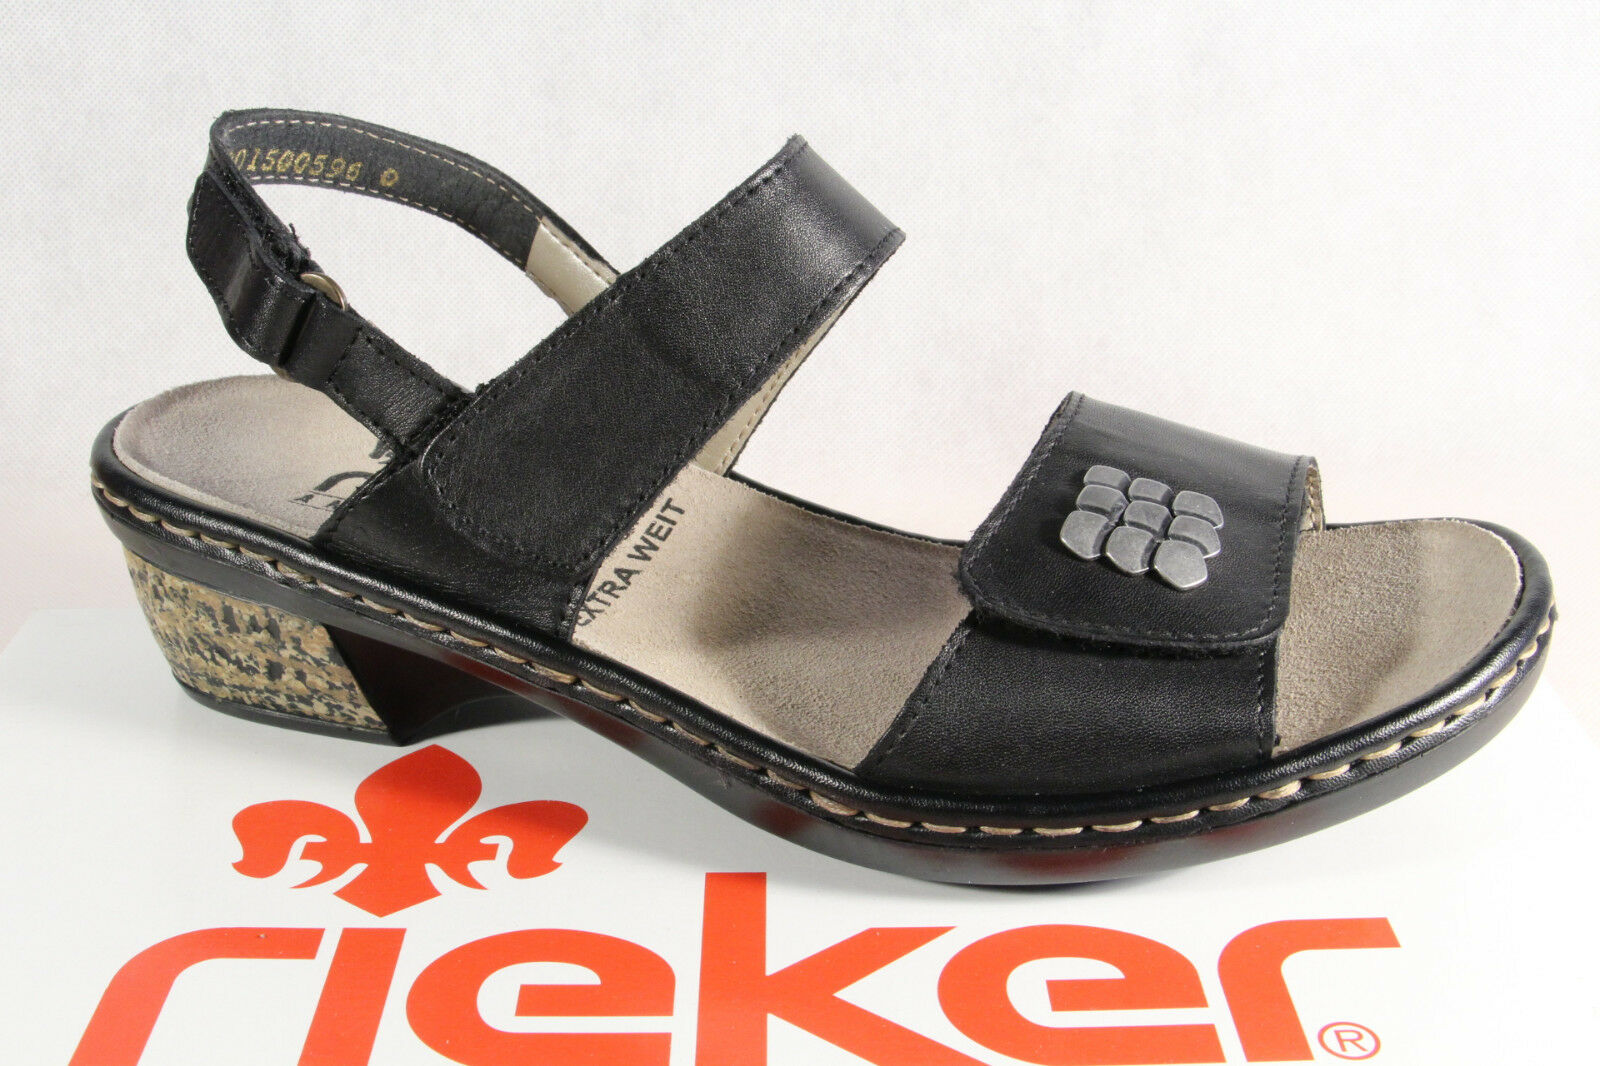 Rieker Damen Sandale Sandalette Sandalen schwarz 67162 Echtleder NEU